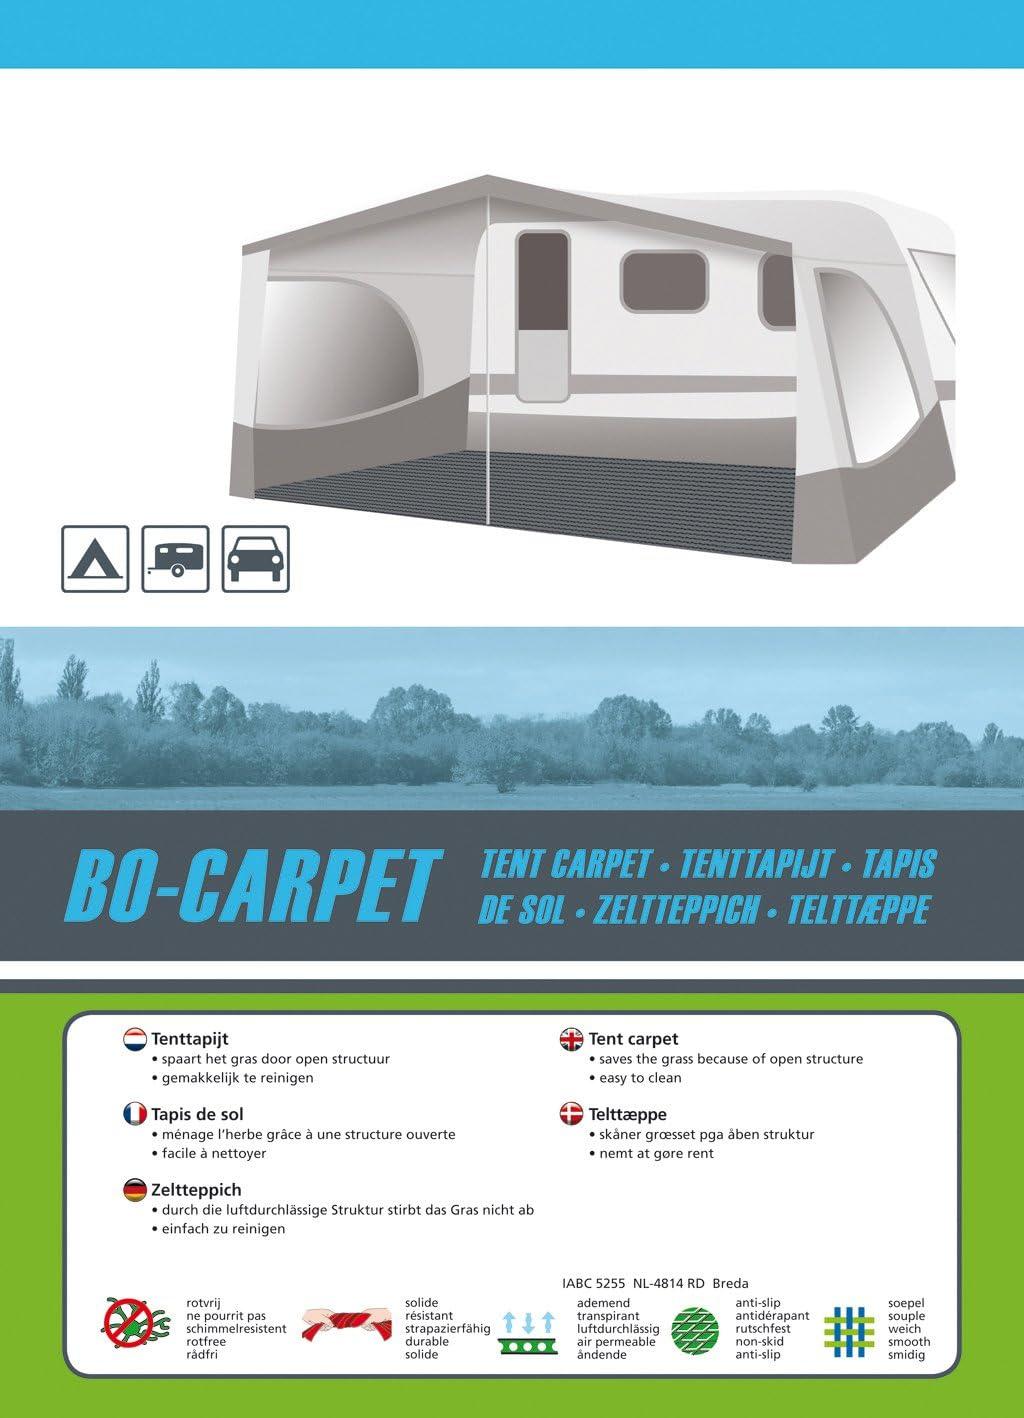 Zeltmatte Bo-Camp Bo-Teppich 2,5 x 5,5 Meter Grau